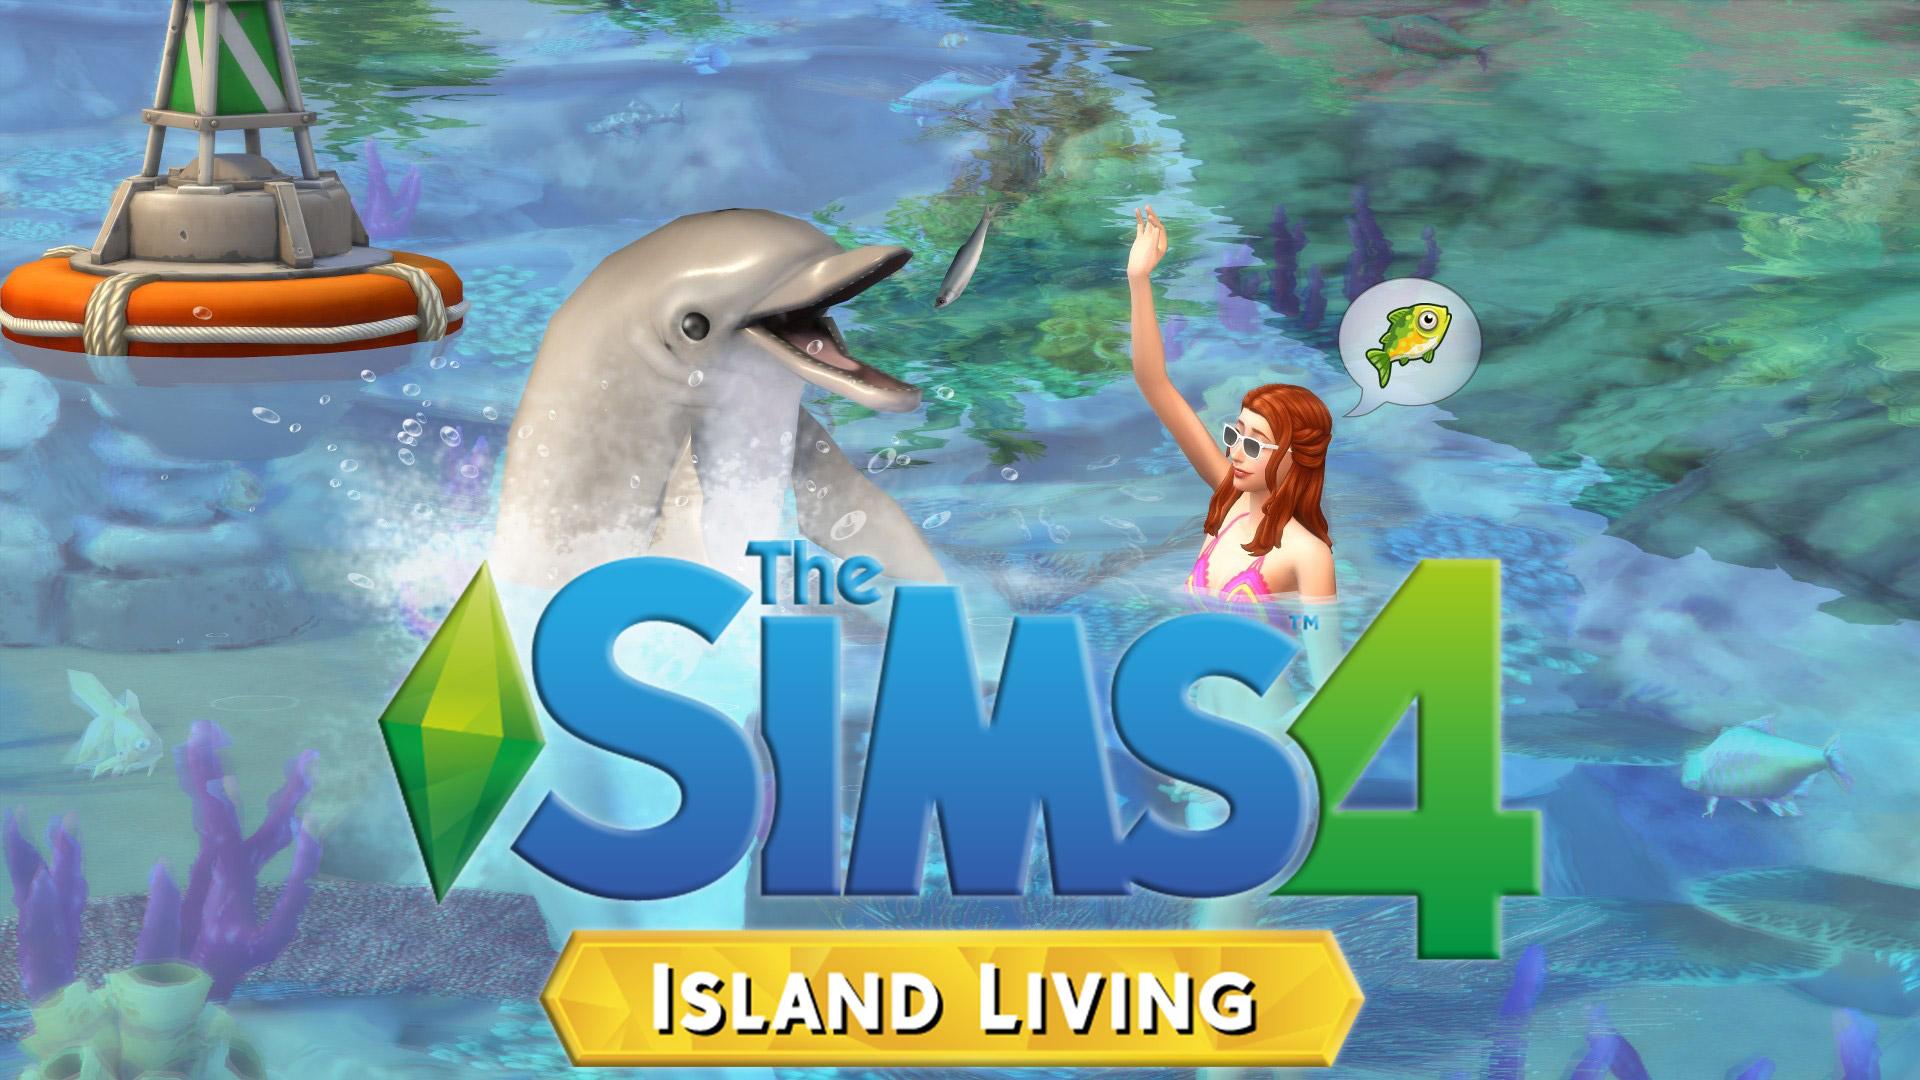 sims 3 island paradise keygen generator download